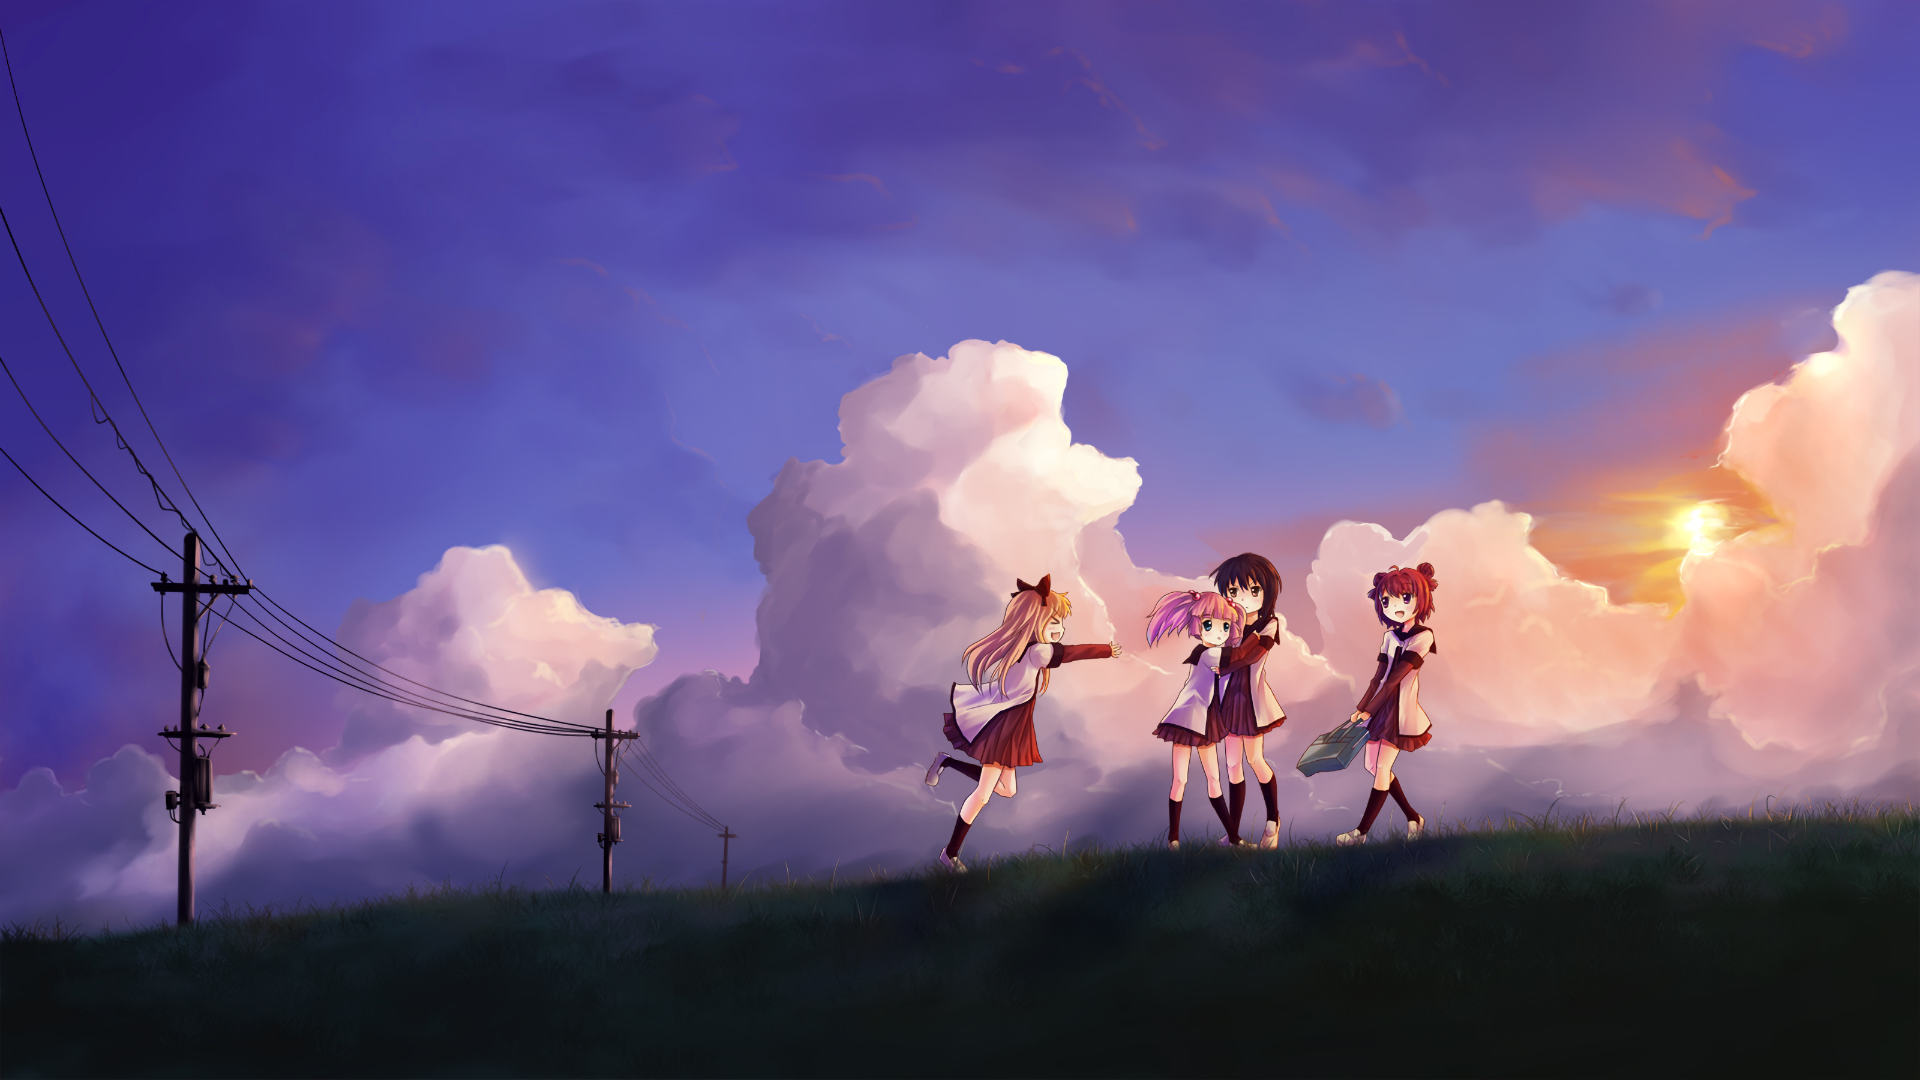 Yuru Yuri Full HD Wallpaper And Background Image